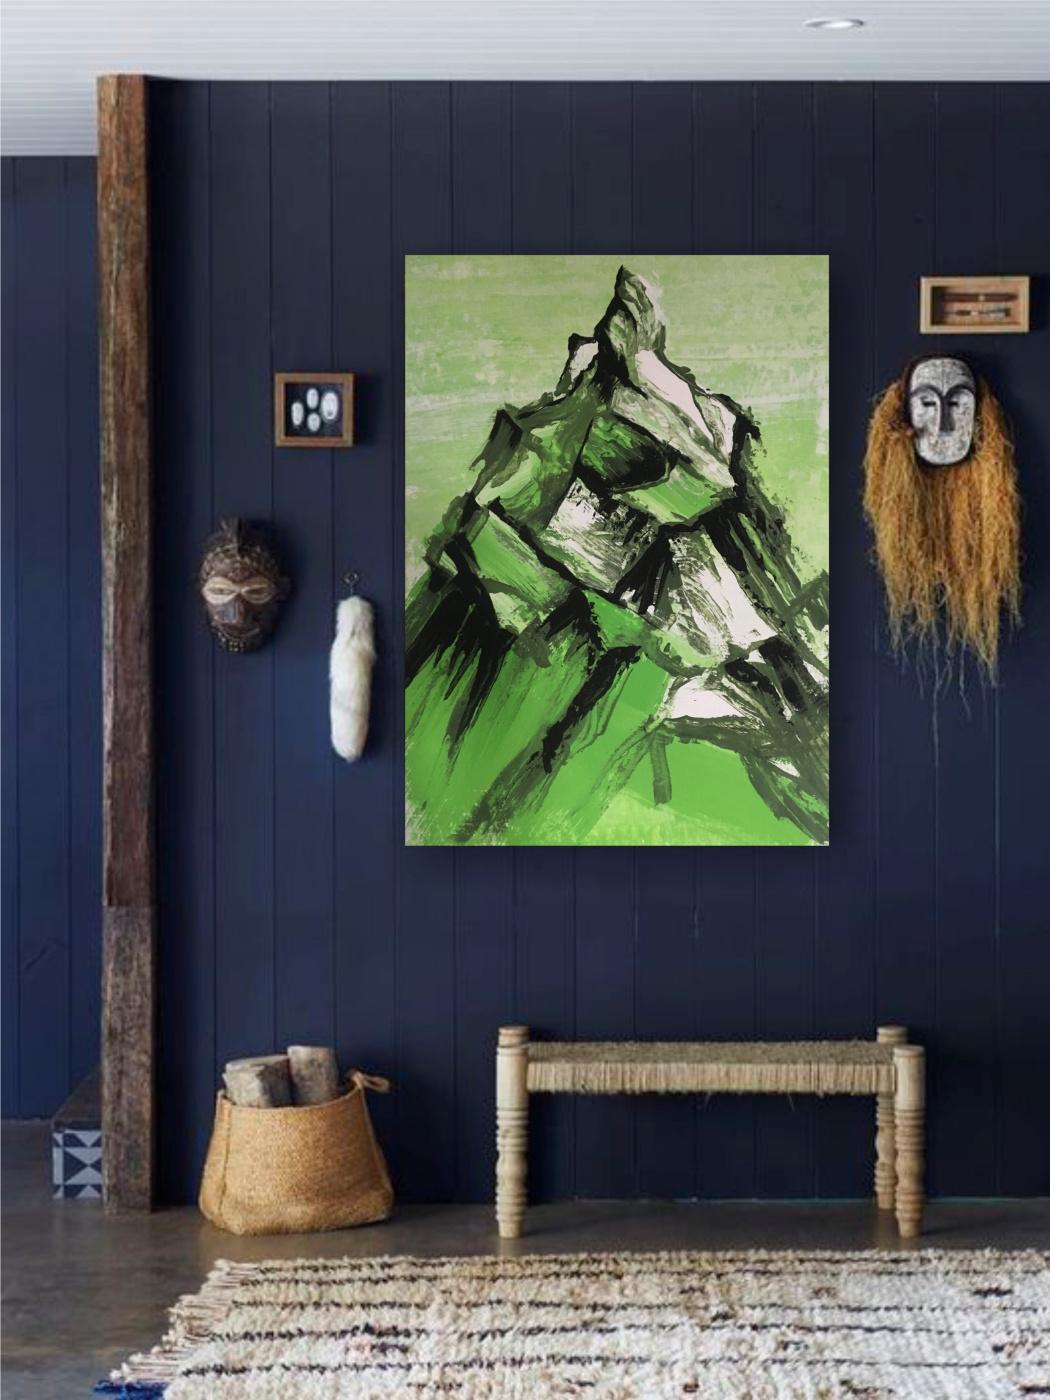 Julia Rashidovna Akhmetova-Walter. Green Mountain